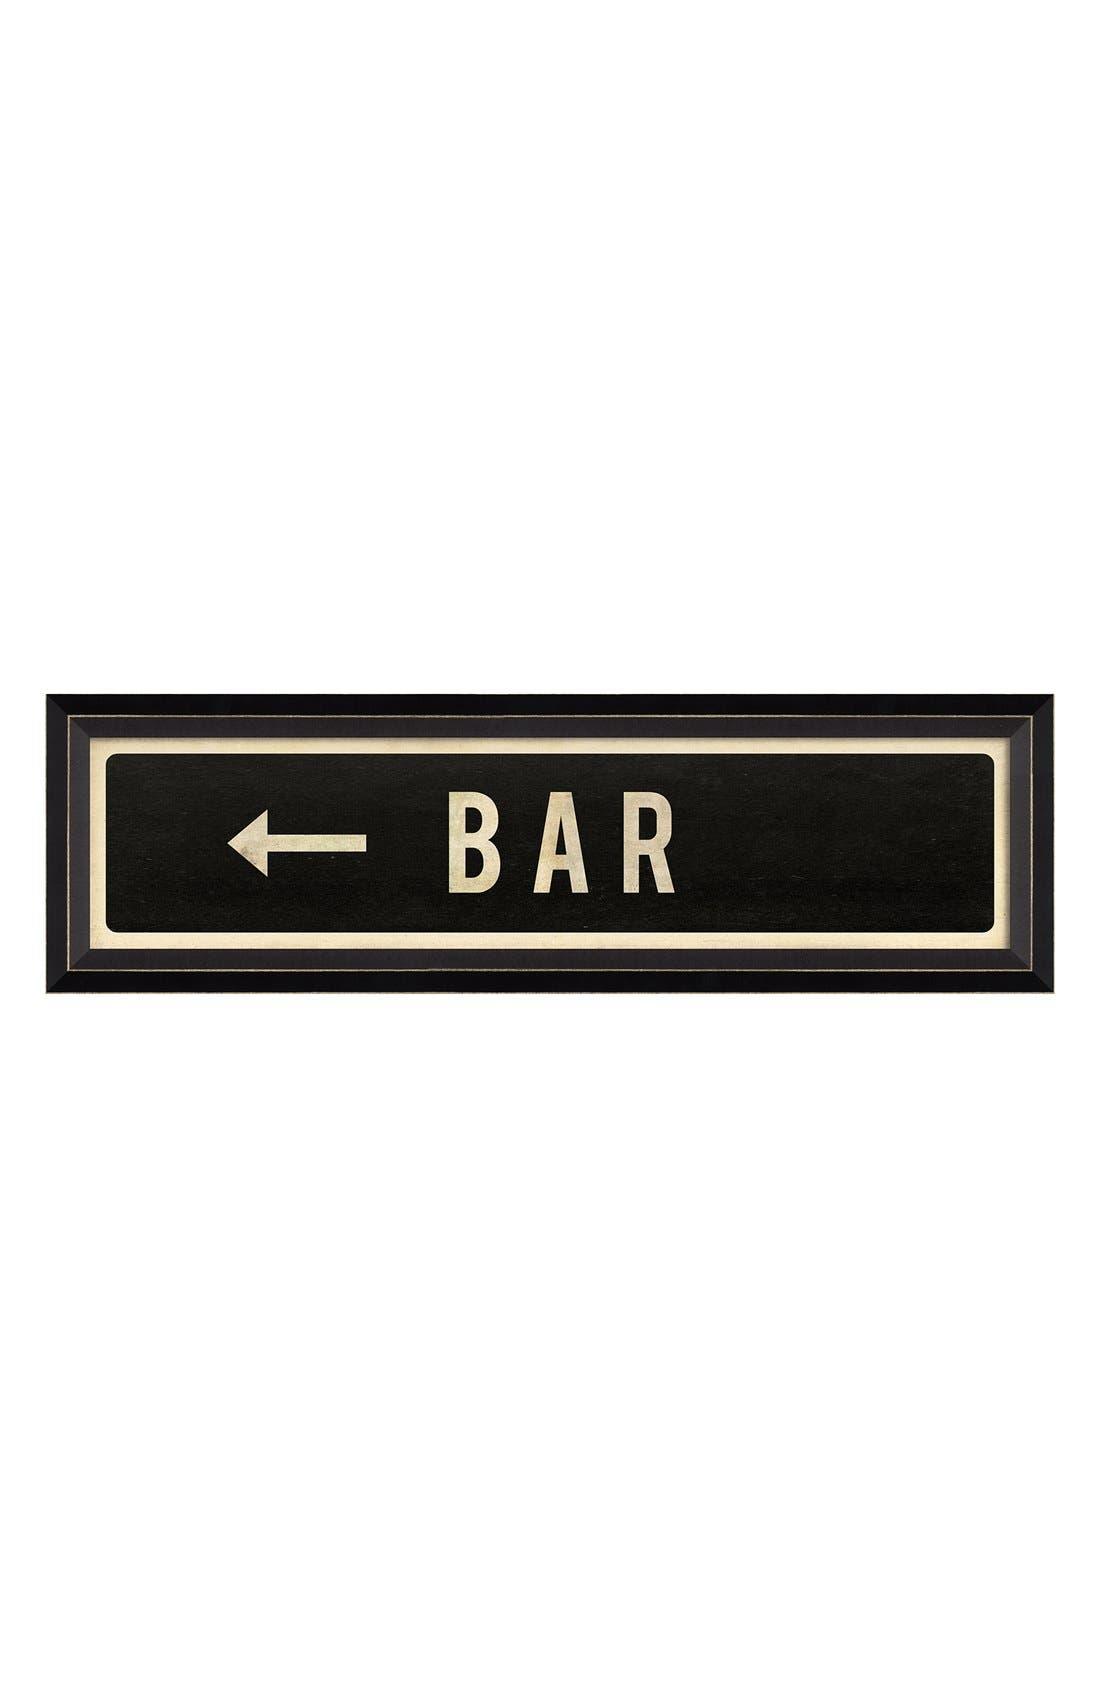 Alternate Image 1 Selected - Spicher and Company 'Bar Left' Vintage Look Street Sign Artwork